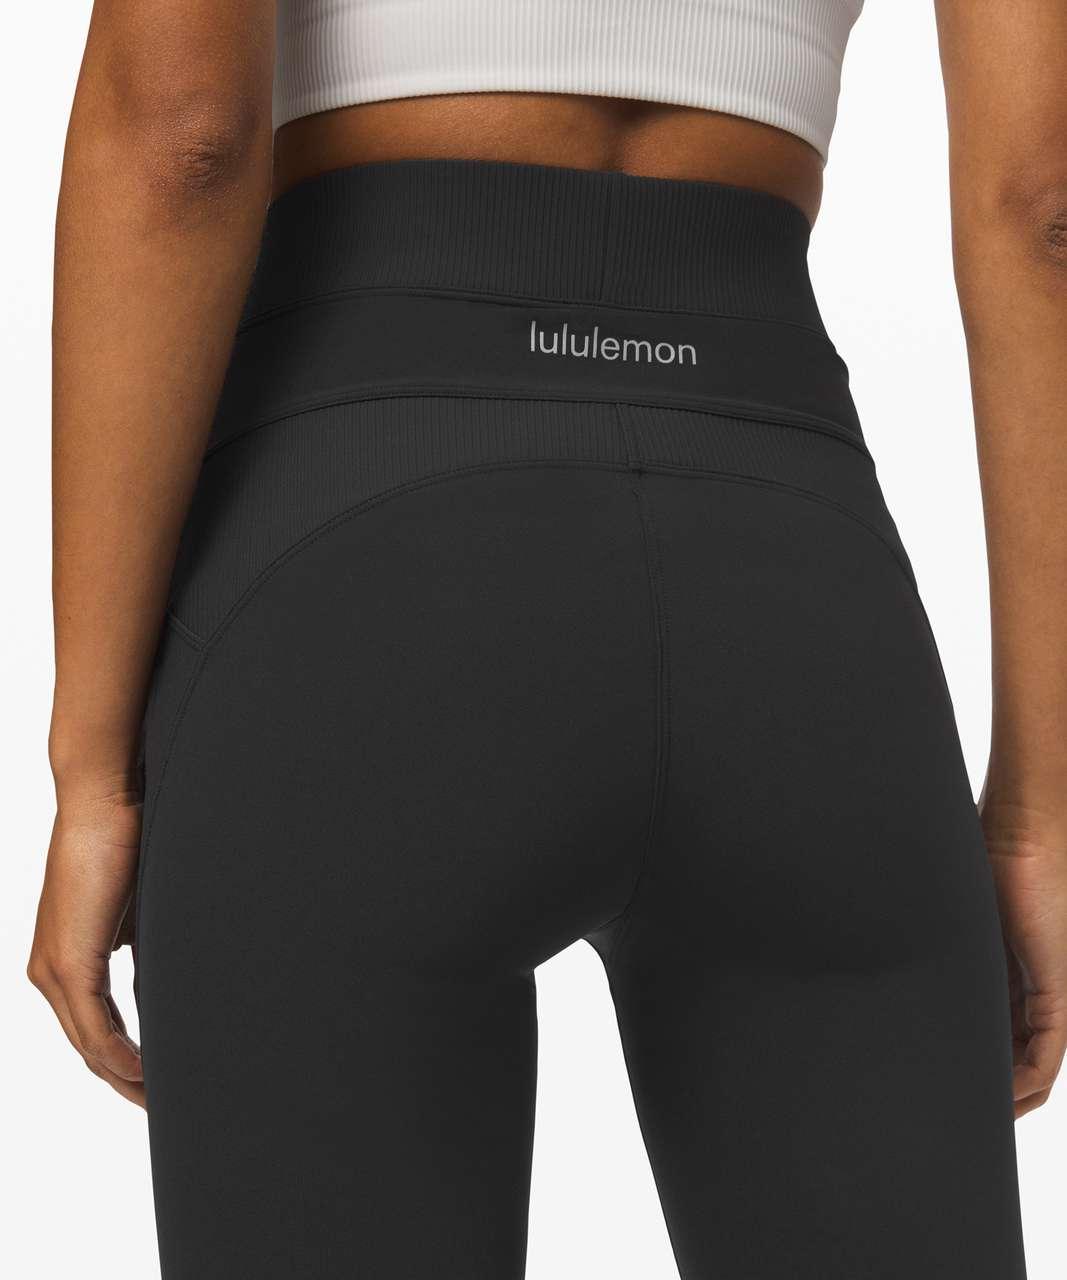 "Lululemon New Ambition Super High-Rise Tight 28"" - Black"